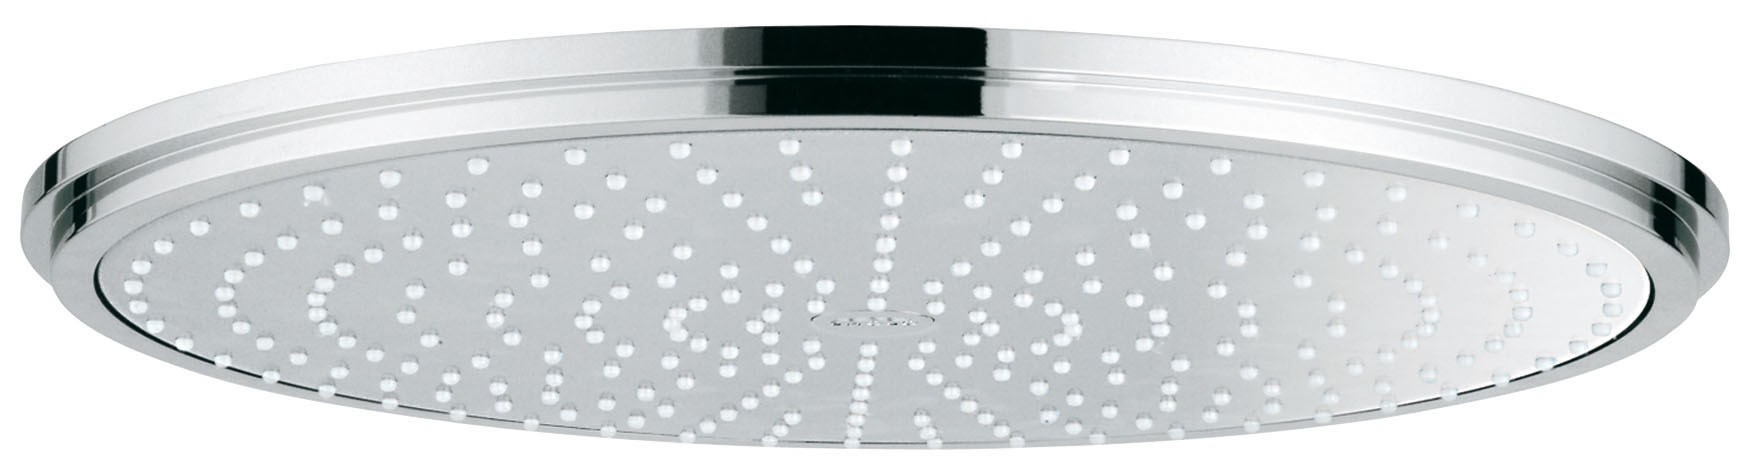 Grohe 28778000 Rainshower Cosmopolitan Metal, 1 режим, диаметр 400 мм, хром